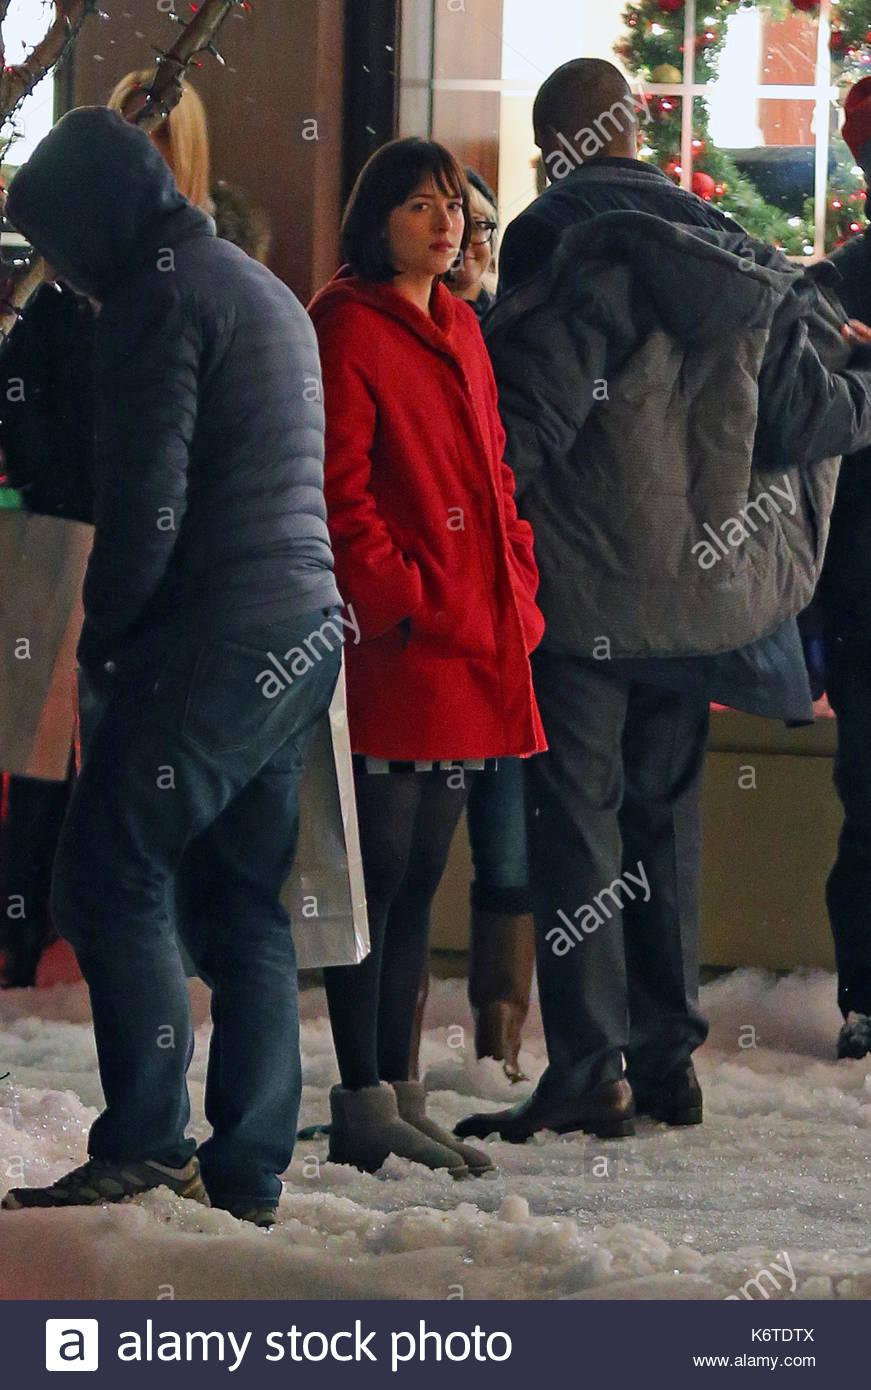 Dakota johnson dakota johnson filming scenes to her new movie how dakota johnson filming scenes to her new movie how to be single in new york city she was filming a scene with fake snow outside the warwick hotel ccuart Image collections